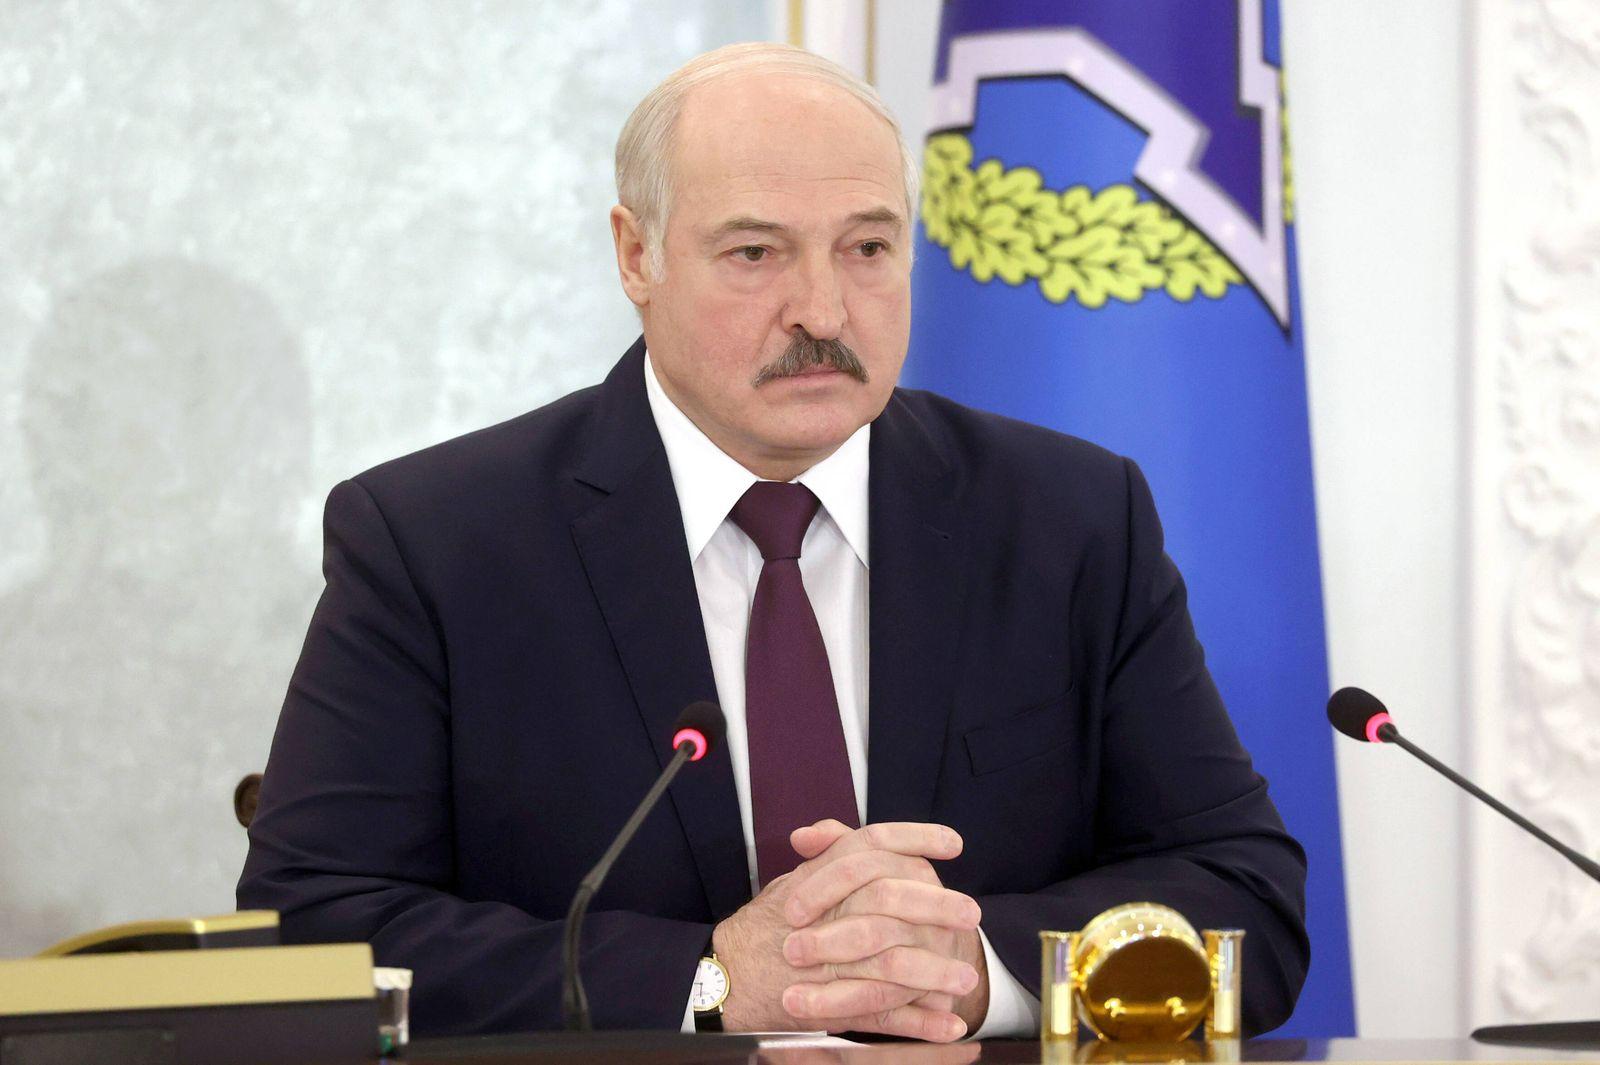 MINSK, BELARUS - DECEMBER 2, 2020: Belarus President Alexander Lukashenko takes part in a meeting of the CSTO (Collecti